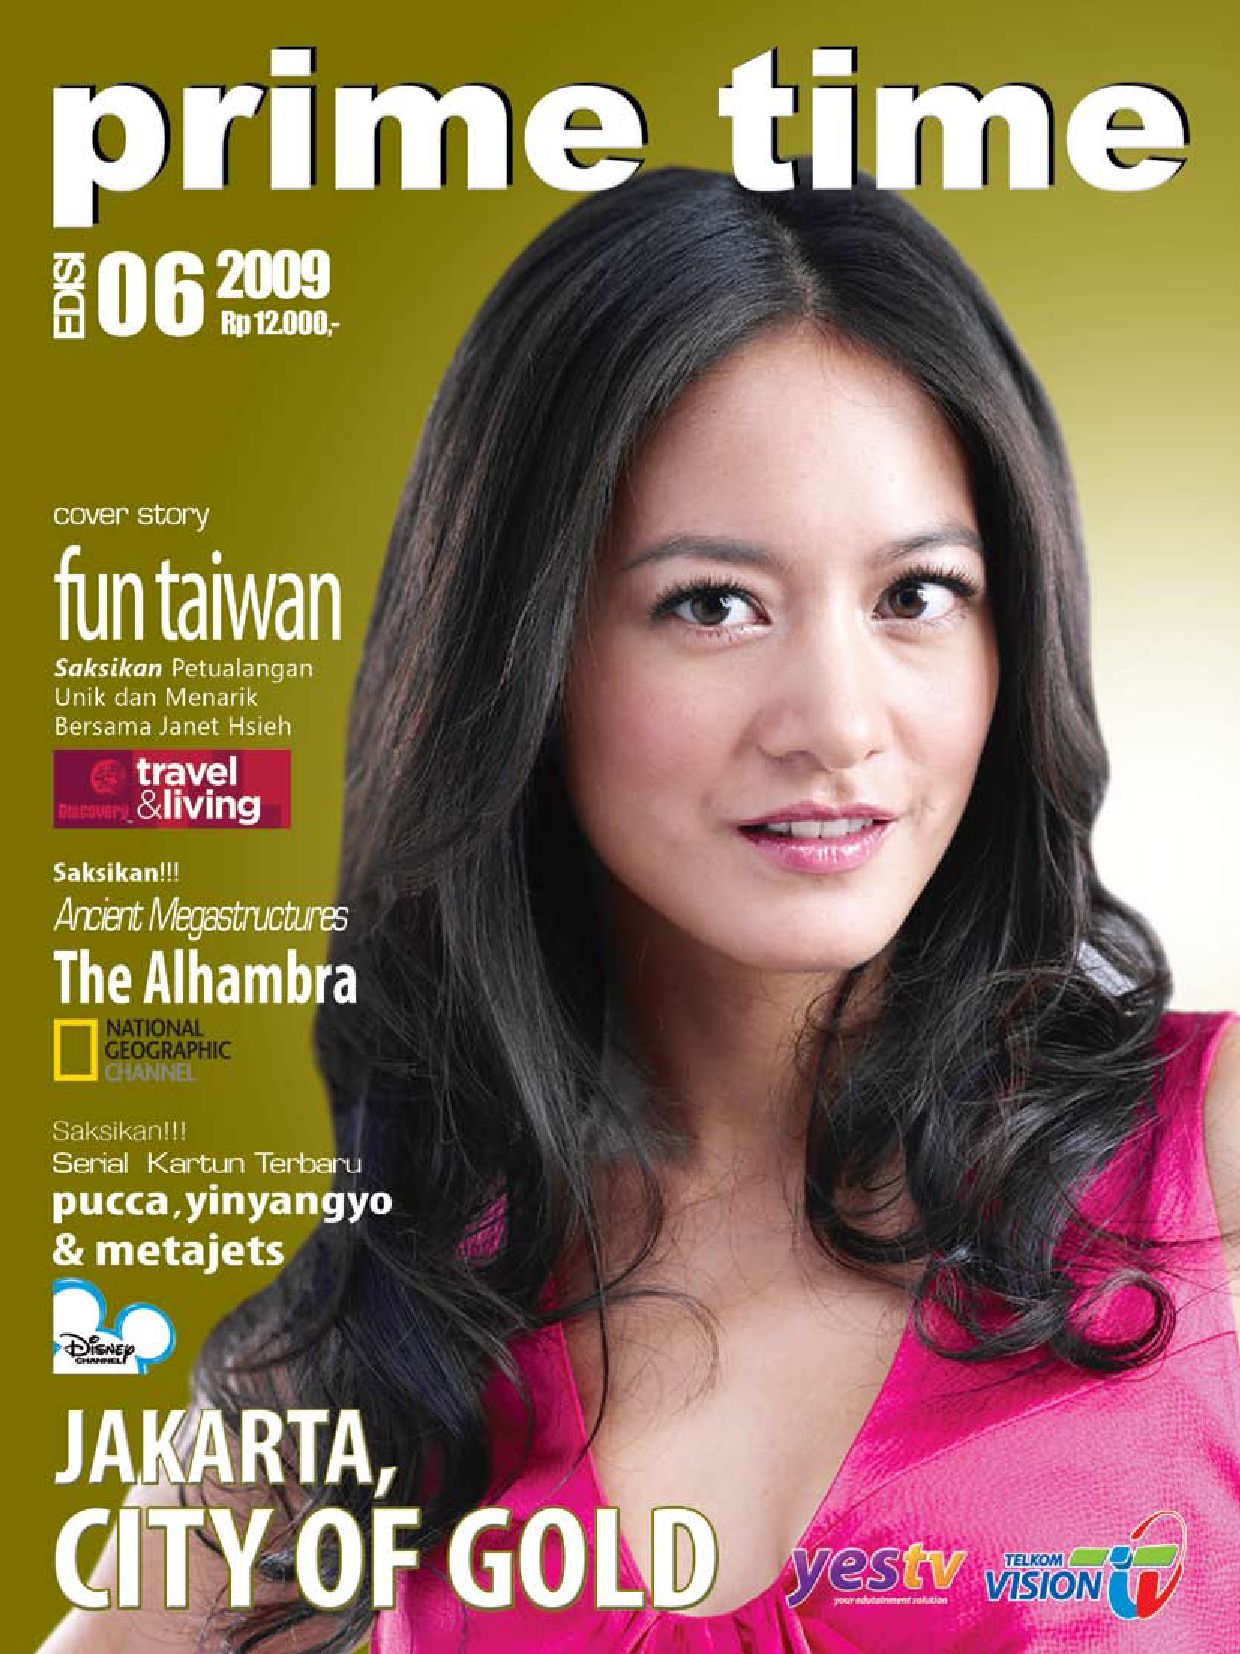 Juni 2009 Primetime Telkomvision By Indonusa Telemedia Issuu Wanita Cantik Katun Hitam Rok 05